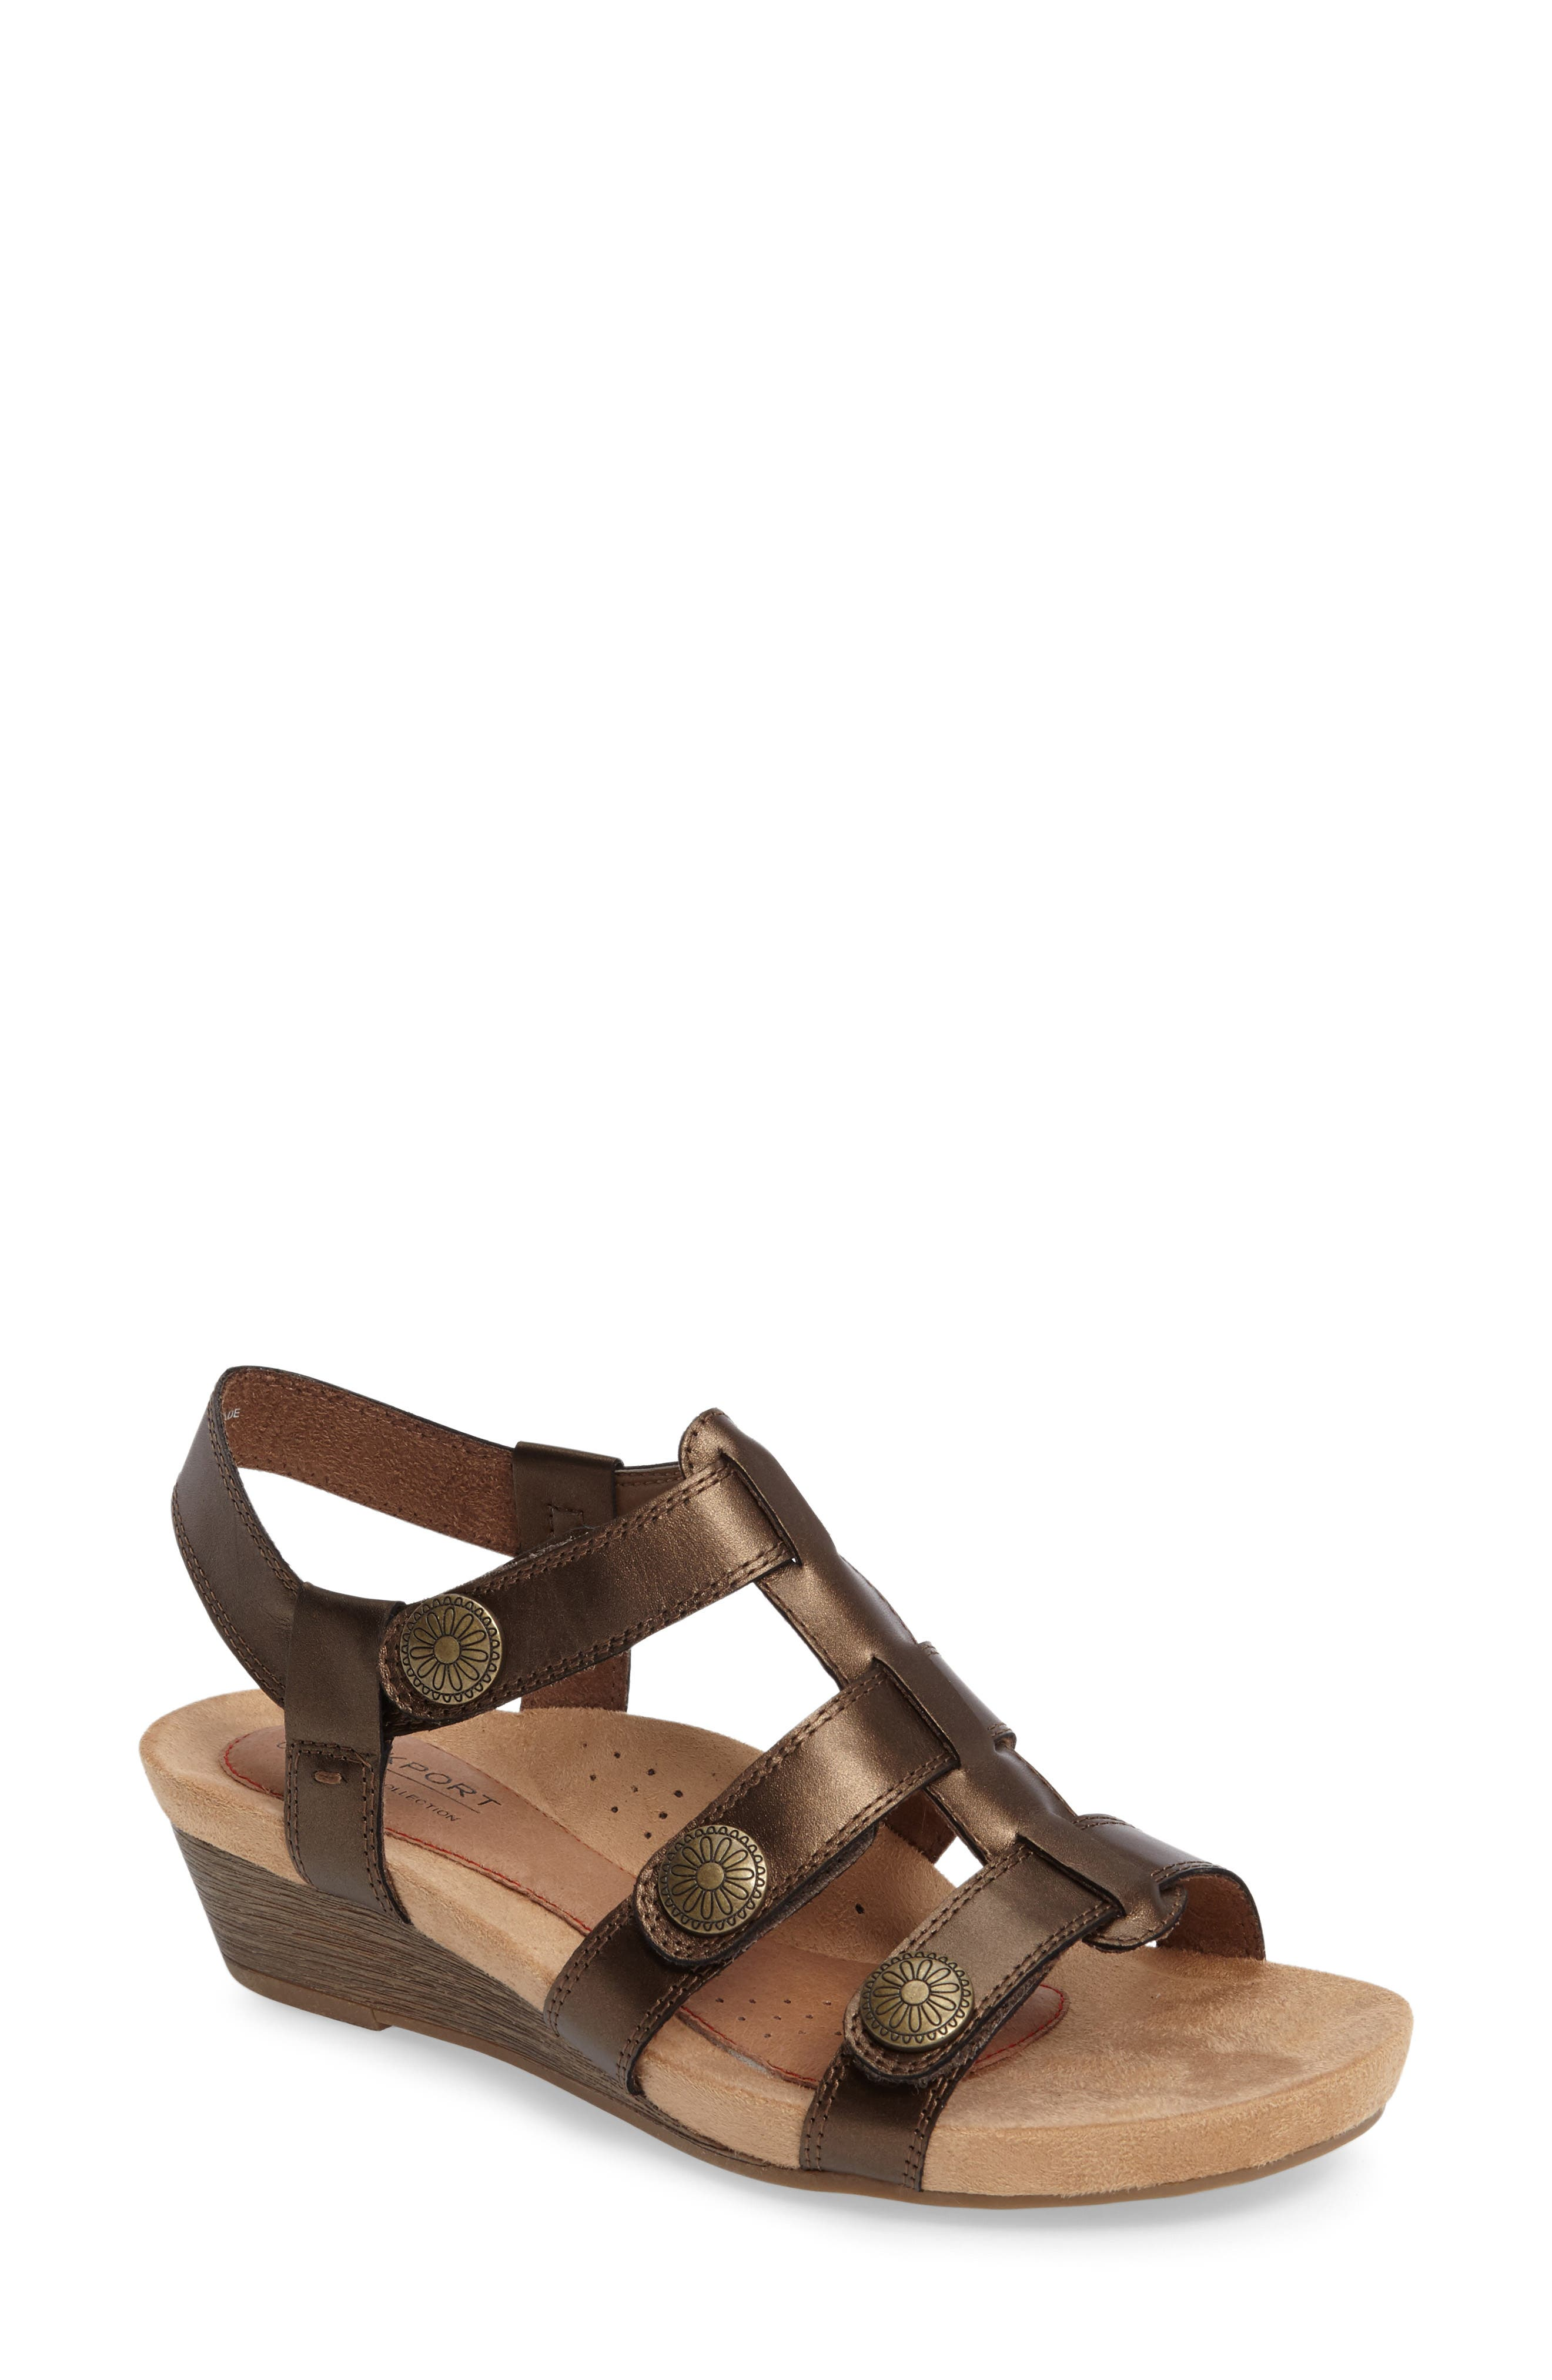 'Harper' Wedge Sandal,                         Main,                         color, Bronze Leather